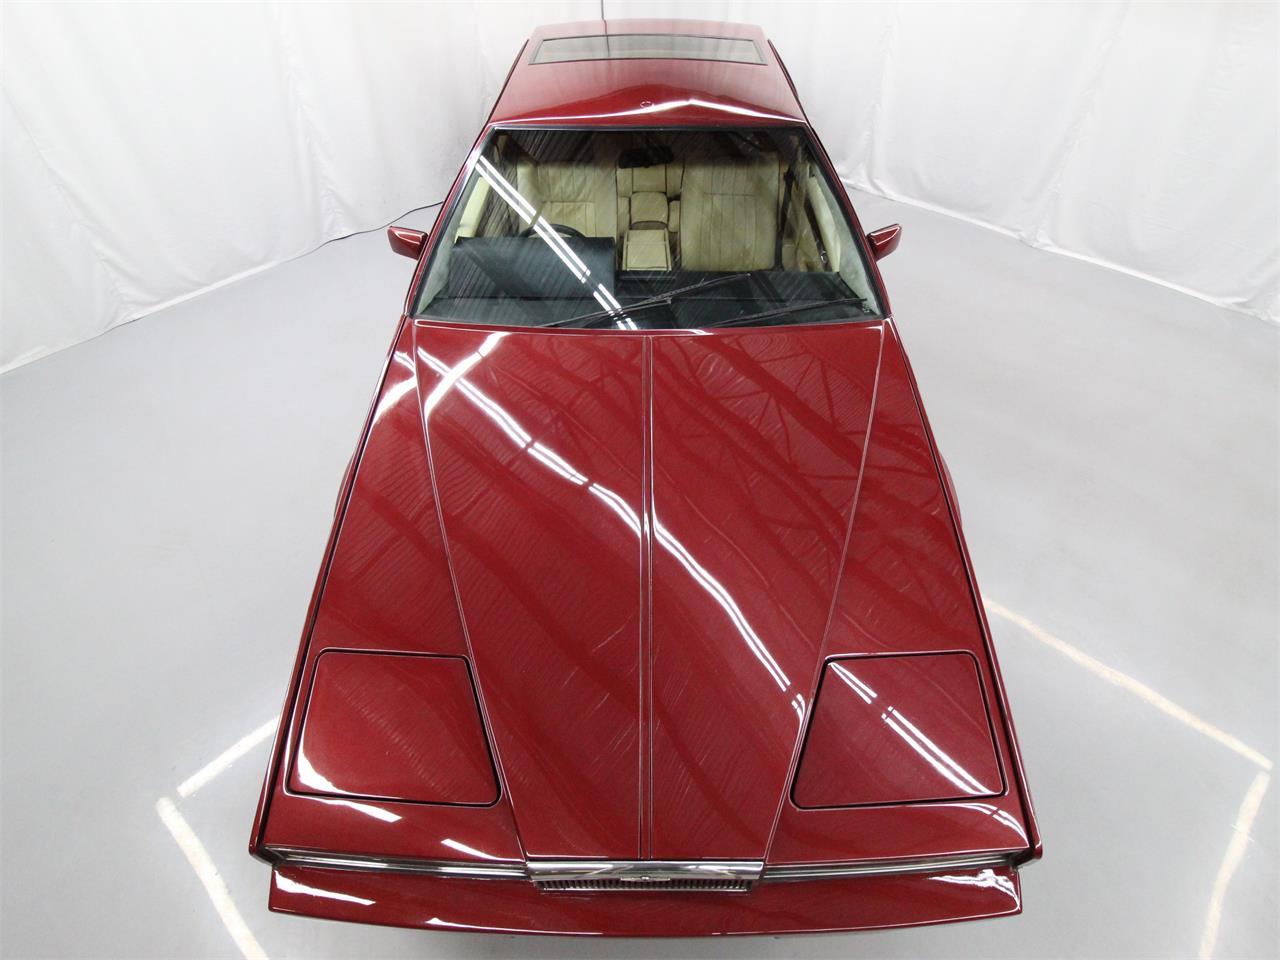 1987 Aston Martin Lagonda (CC-1334021) for sale in Christiansburg, Virginia